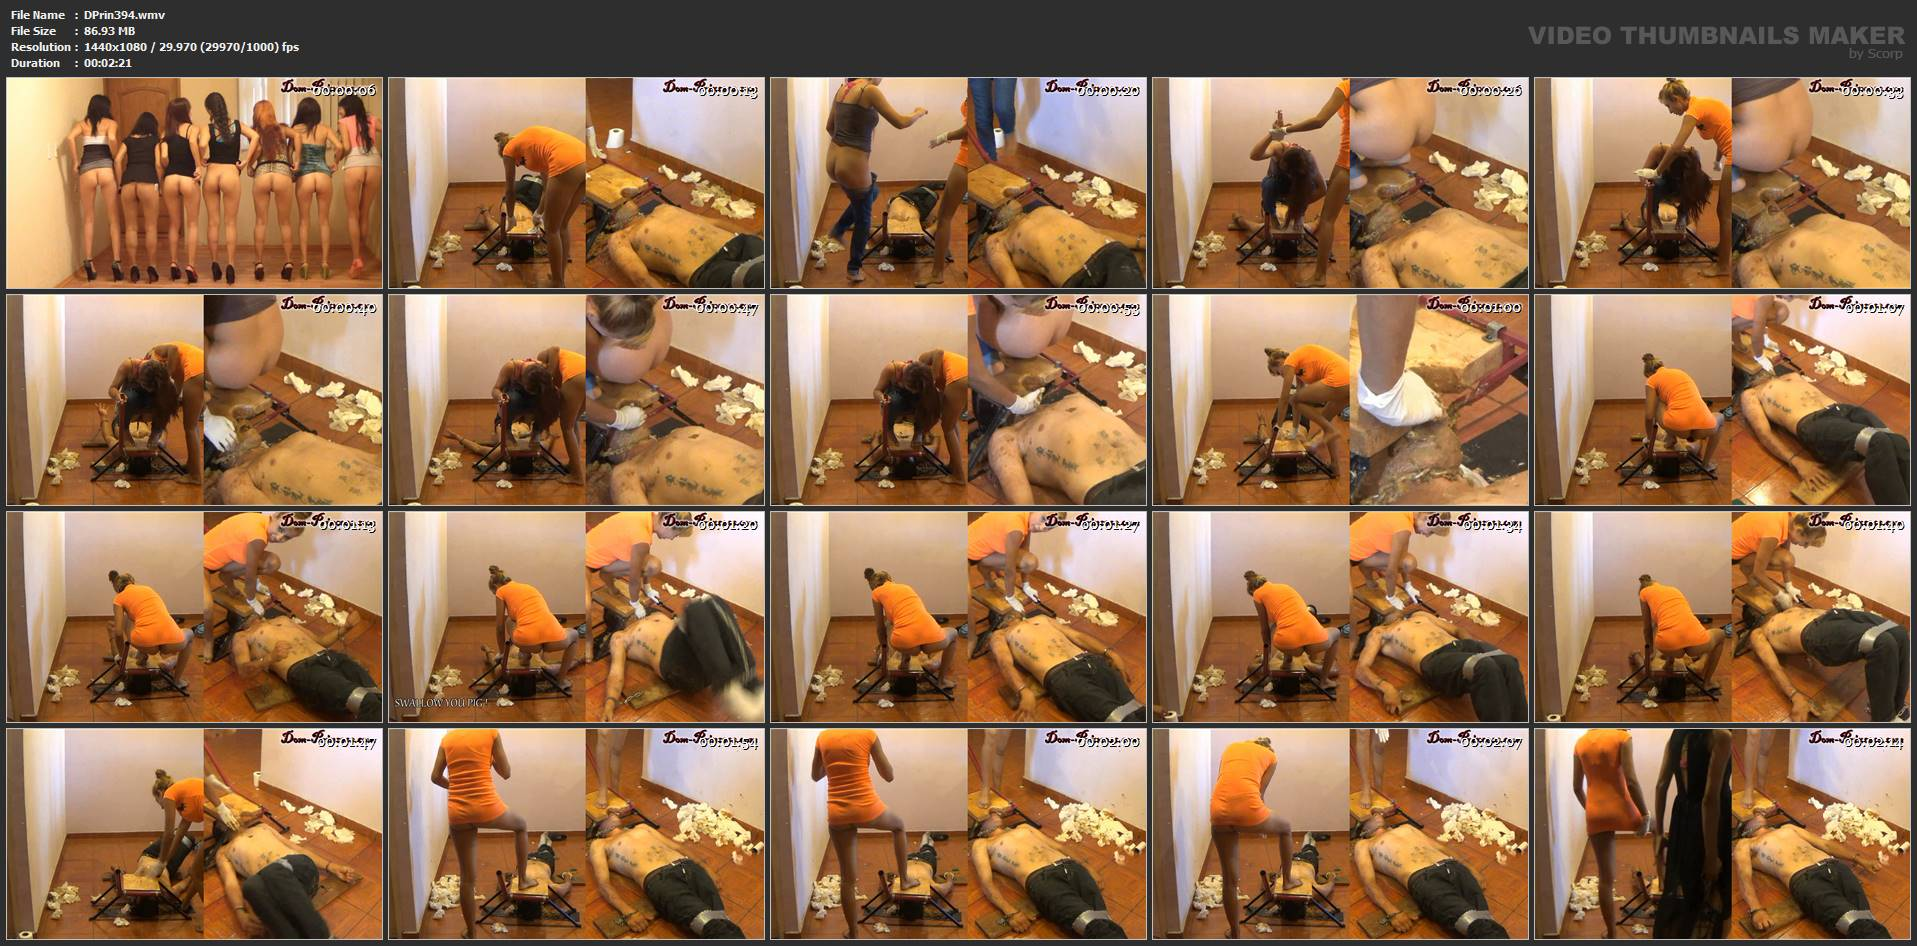 [DOM-PRINCESS] The Raw Tapes, Braking a Man into a Human Toilet Part 6 Karina [FULL HD][1080p][WMV]